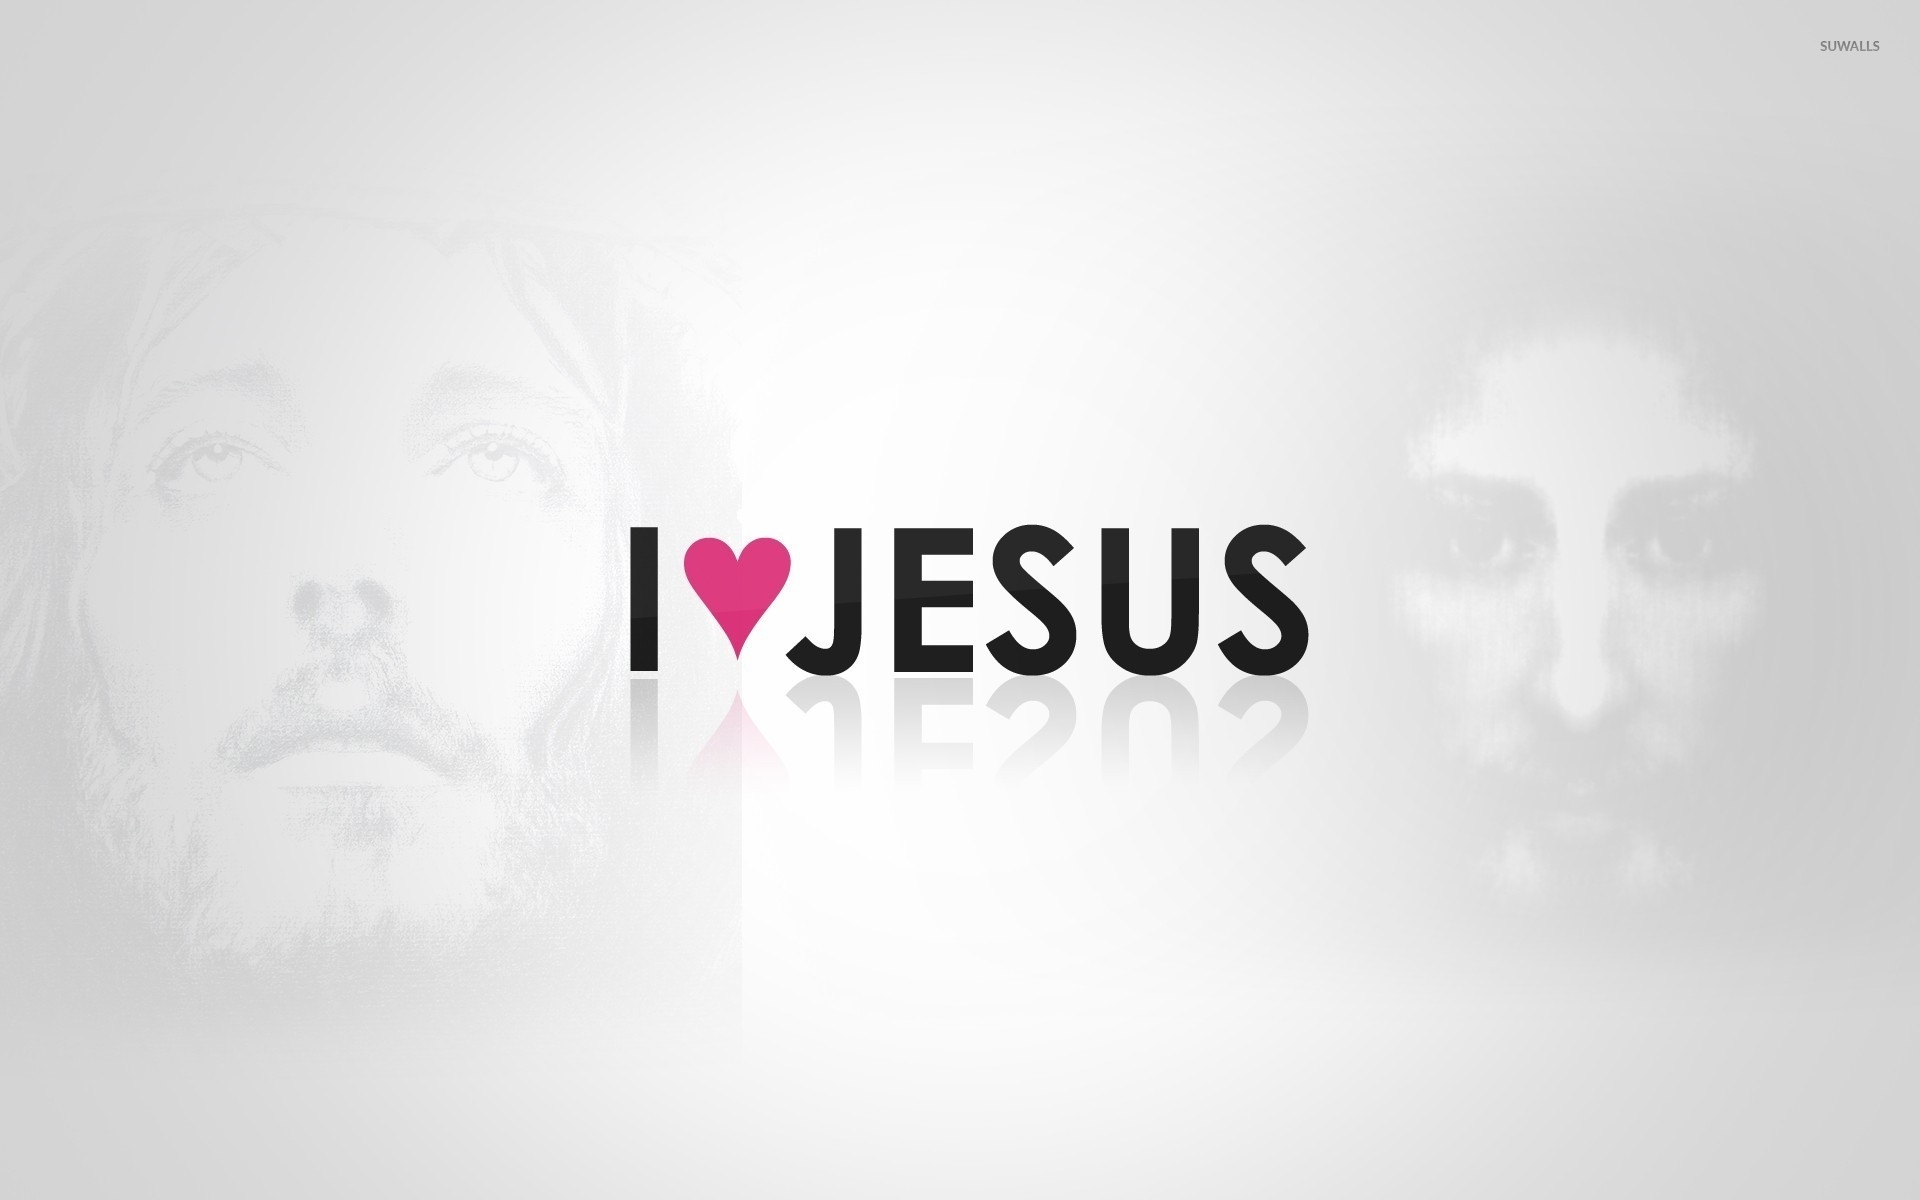 i love jesus wallpaper - religion wallpapers - #30519